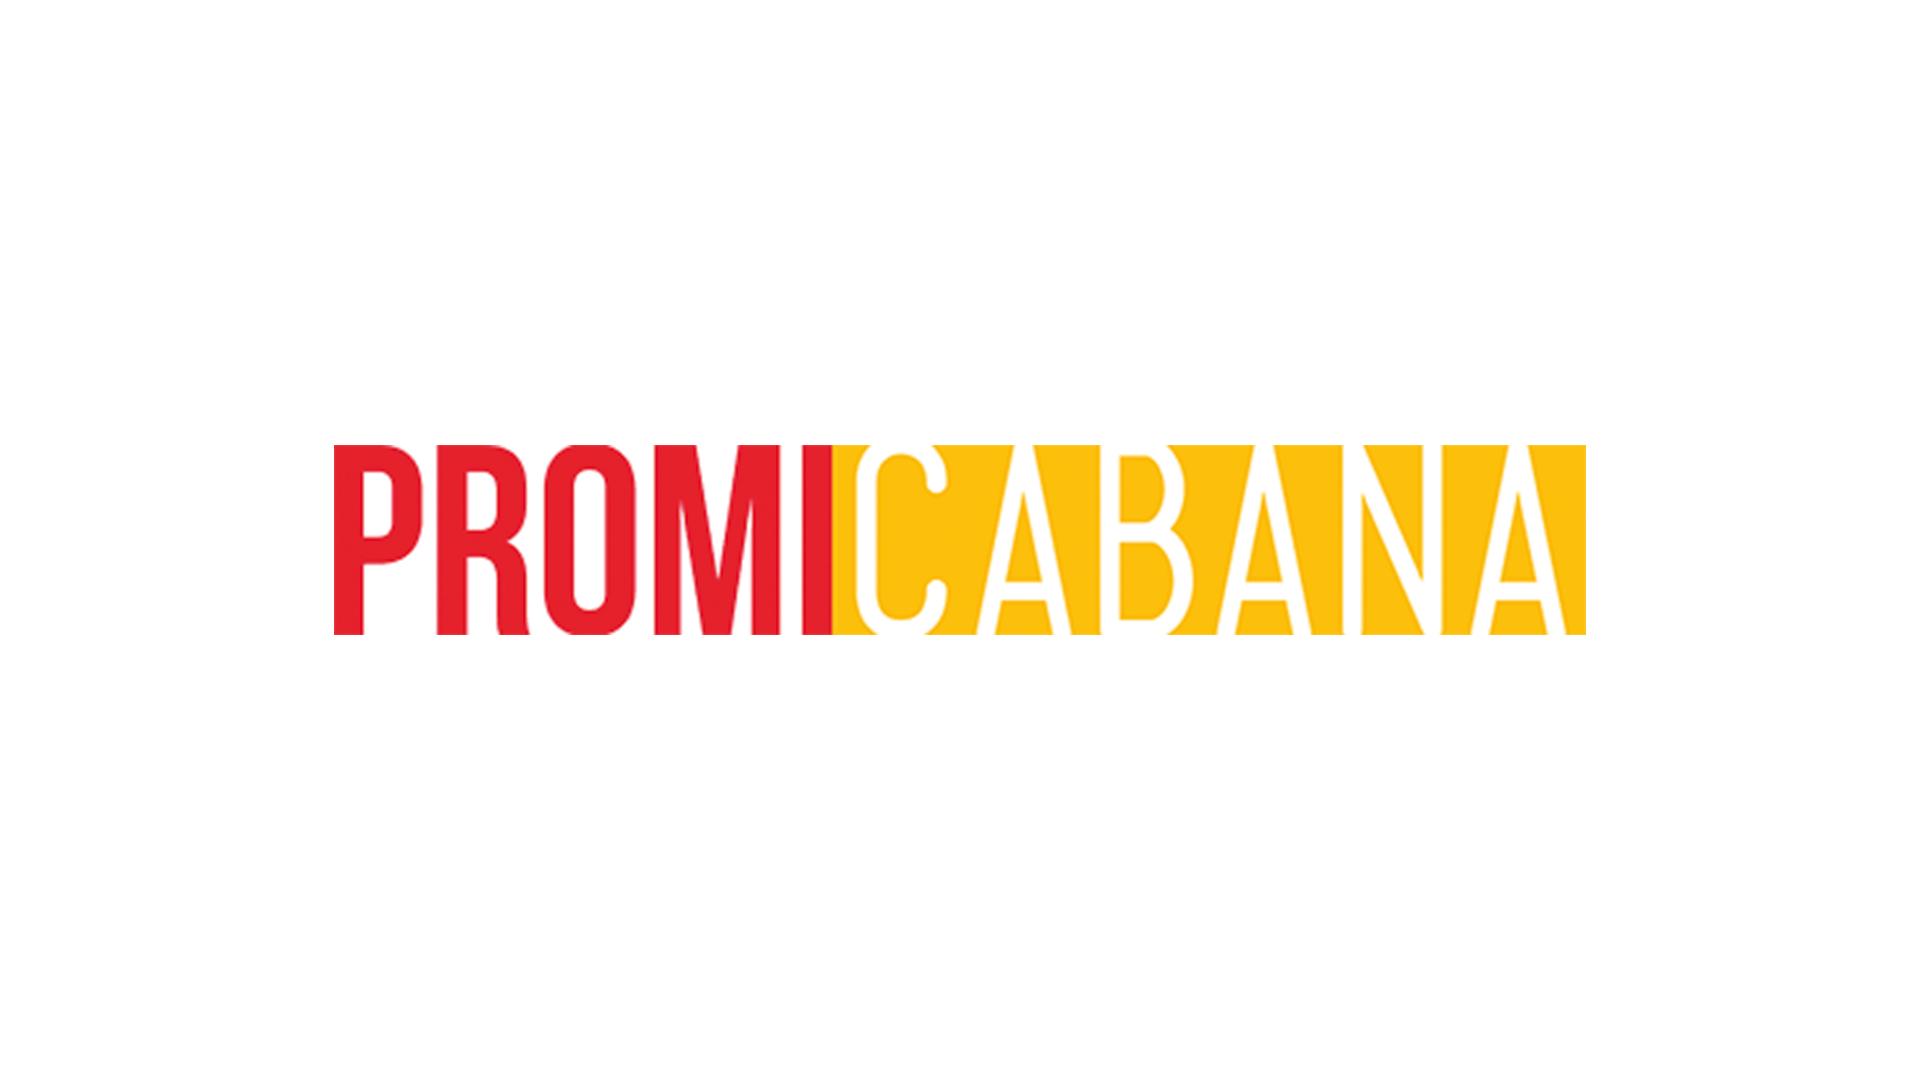 Bruce-Springsteen-Donald-Trump